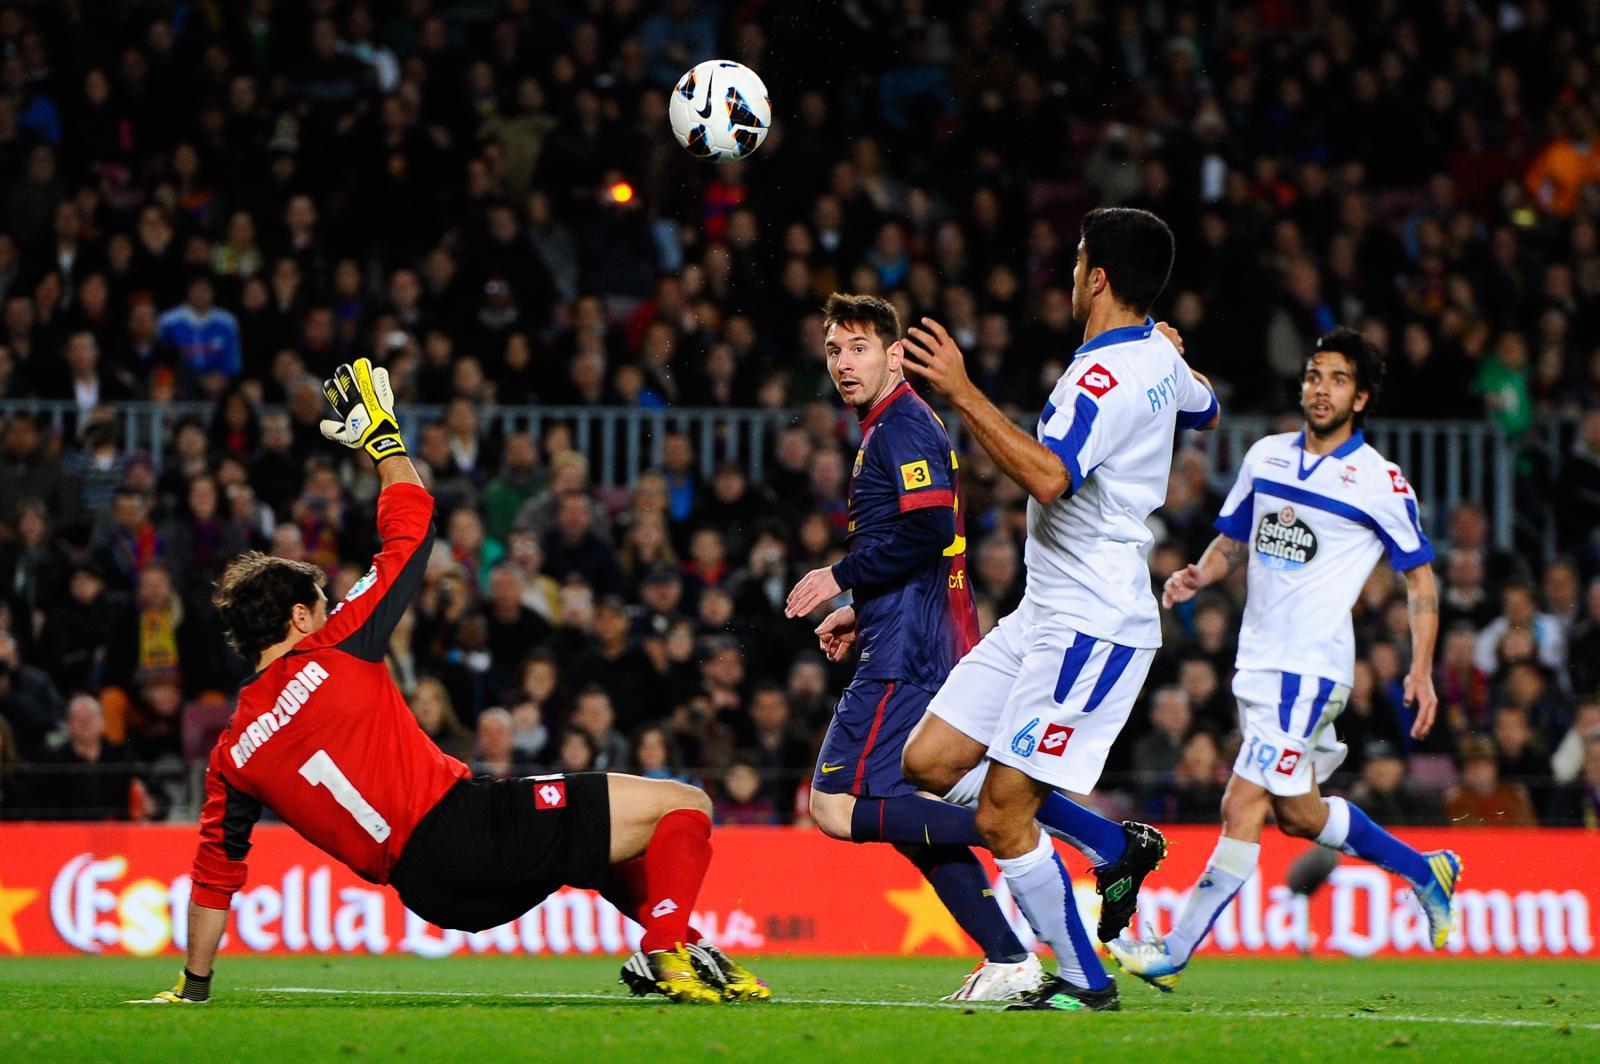 Deportivo La Coruna 0 - 4 Barcelona (Tây Ban Nha 2014-2015, vòng )